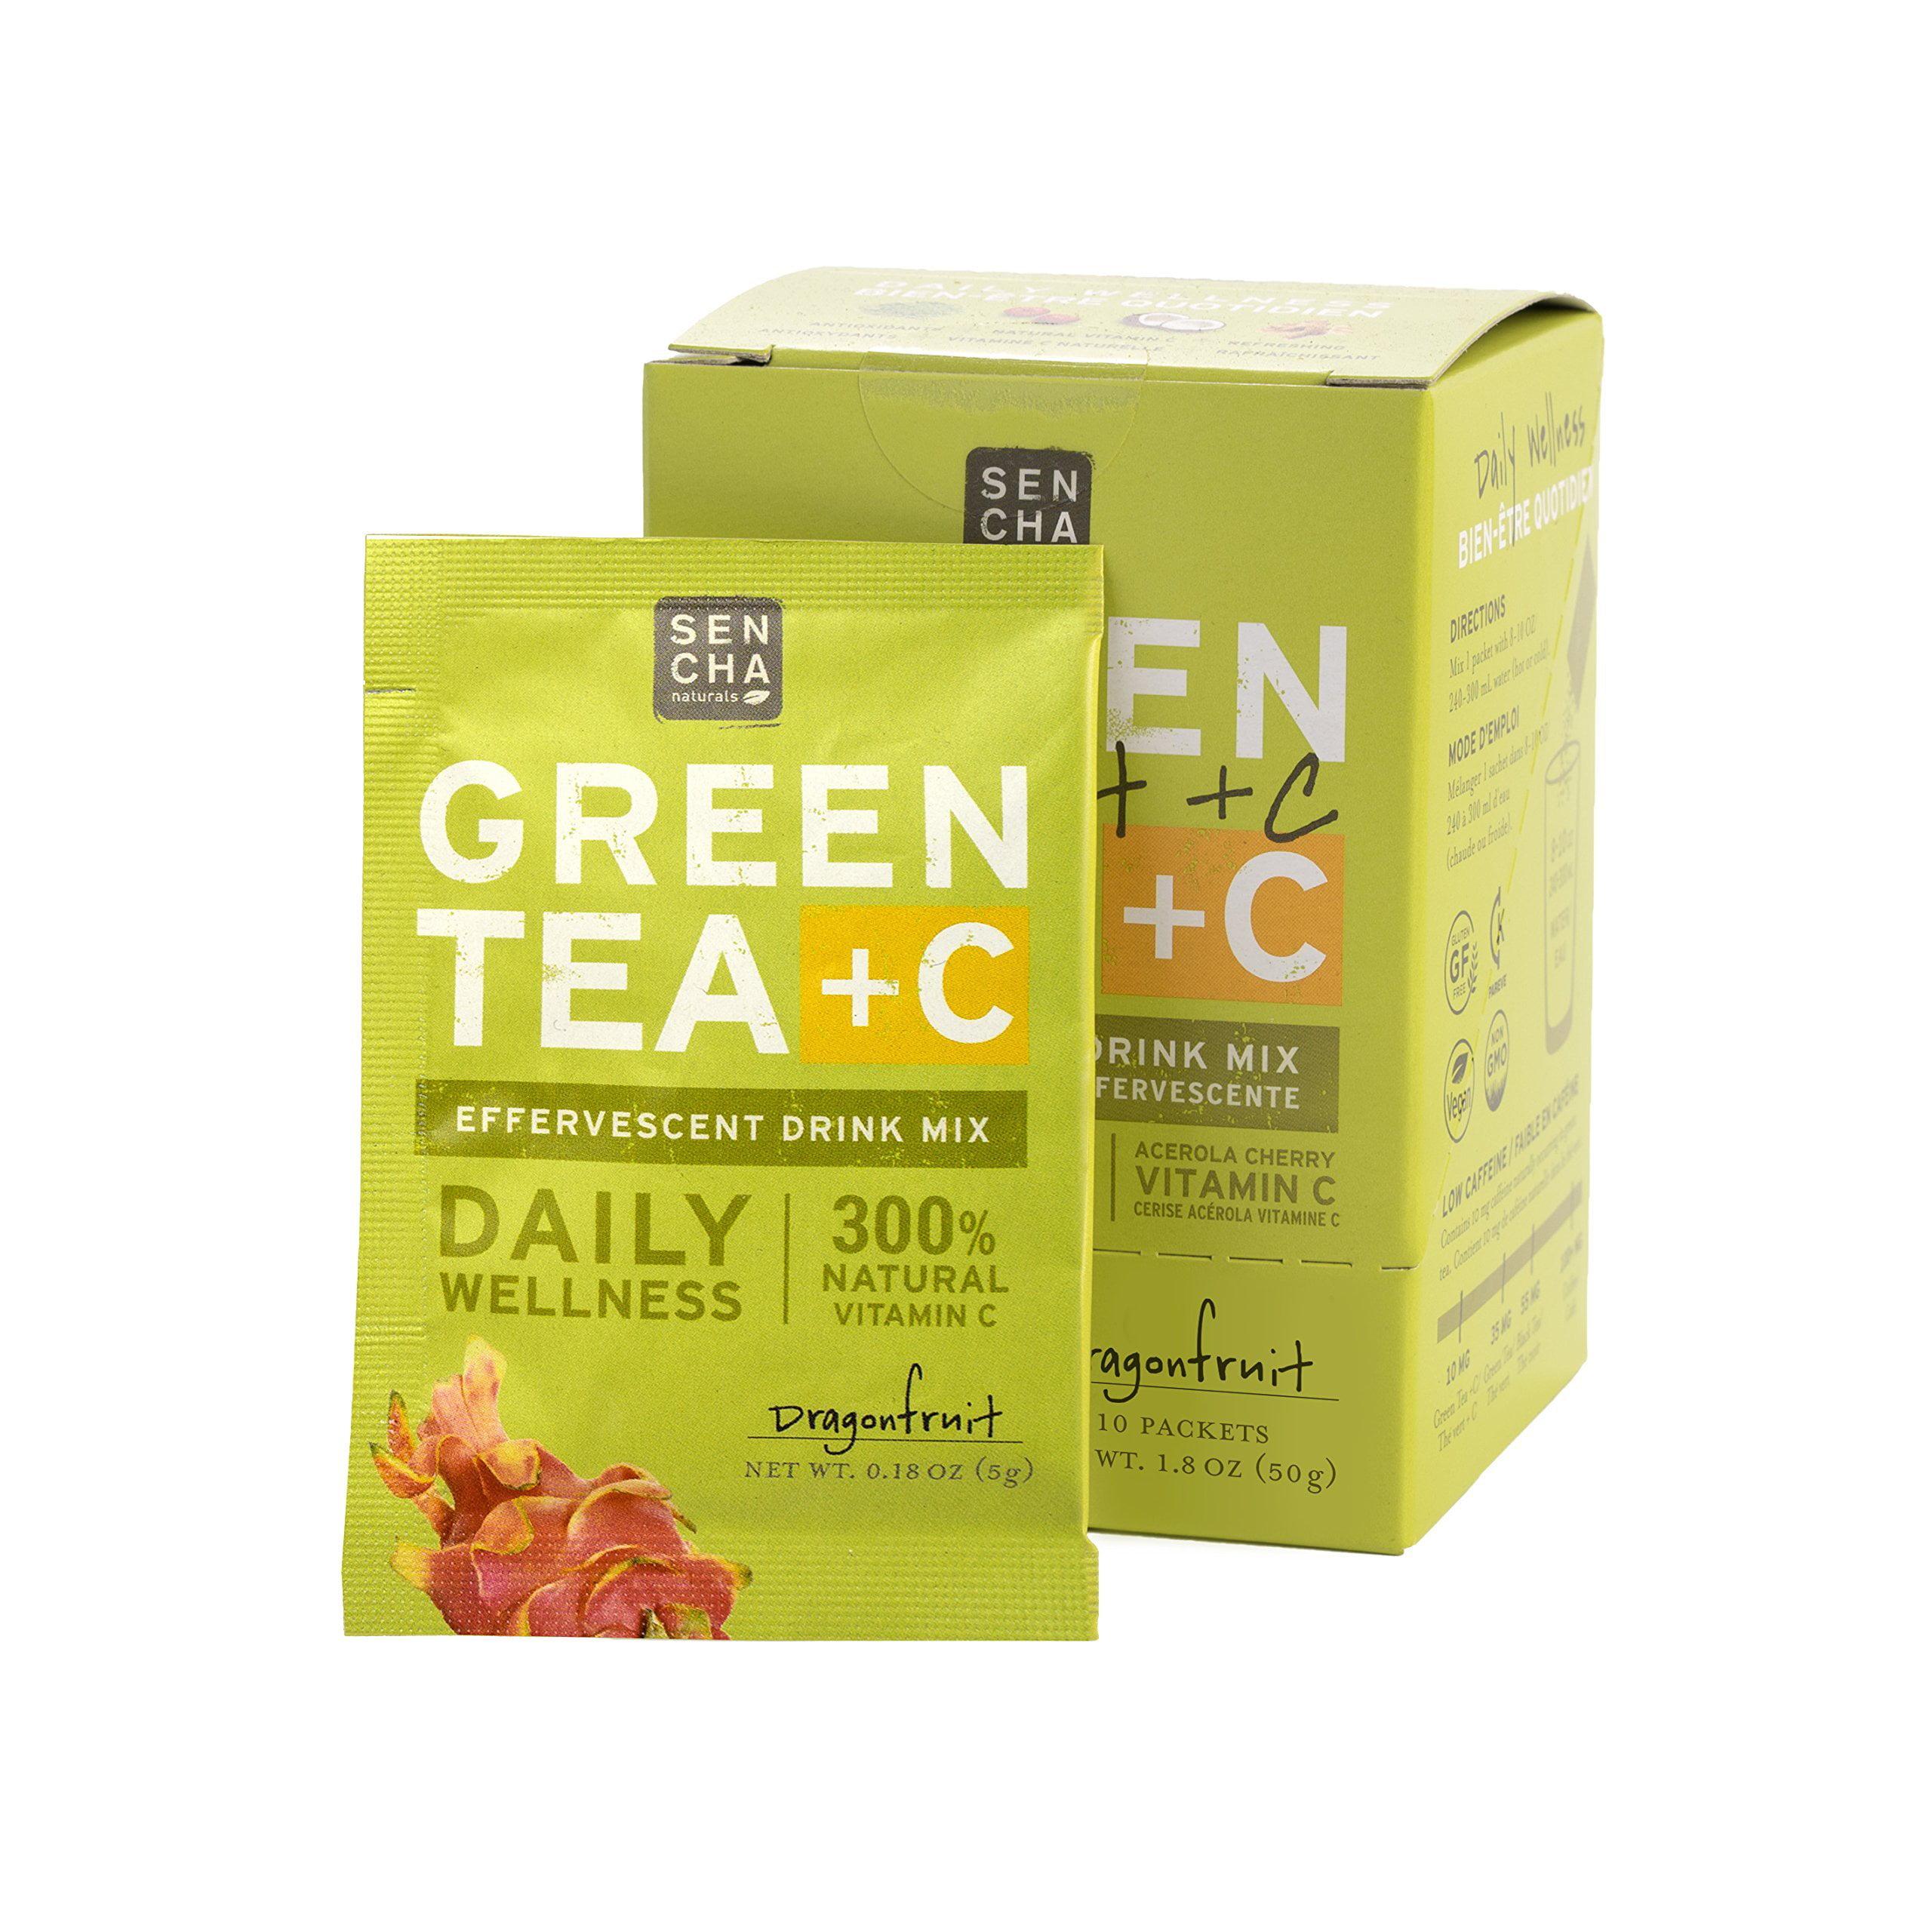 Sencha Naturals Green Tea C Citrus Ginger Box Of 10 Packets Effervescent Drink Powder Mix With Organic Matcha Green Tea Antioxidant Vitamin C Orange Peel Turmeric Ginger Acerola Cherry Walmart Com